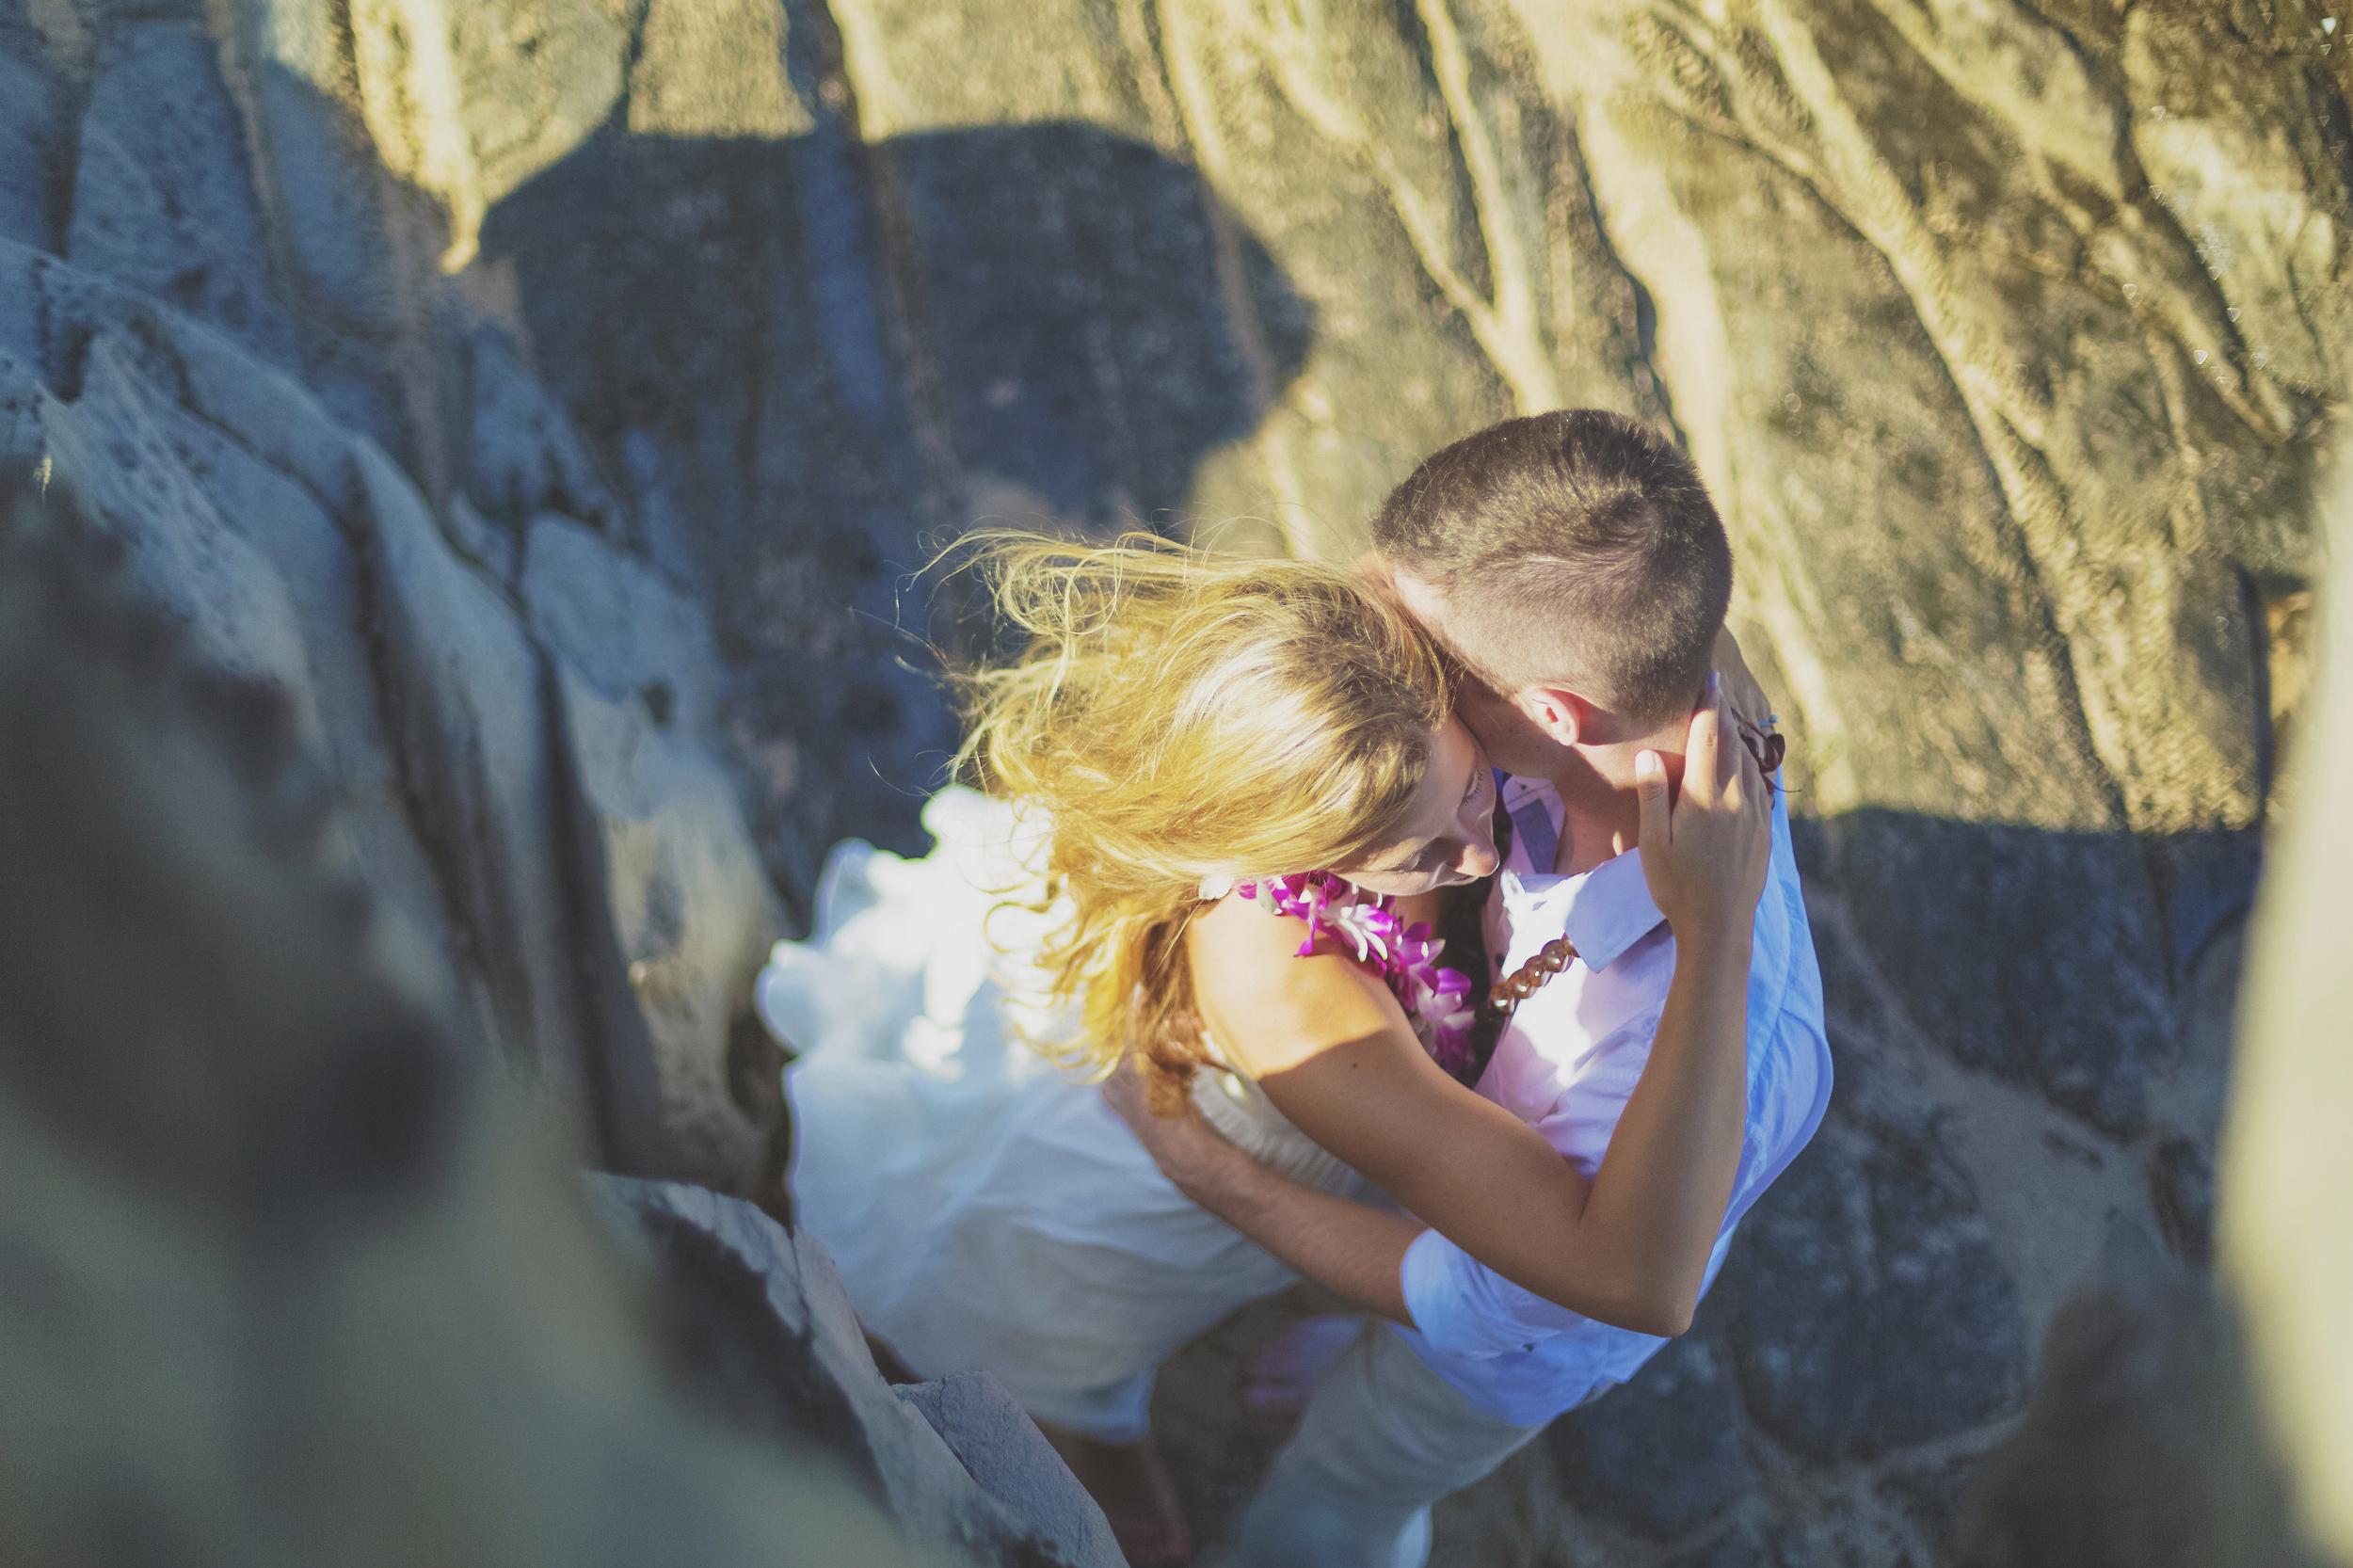 angie-diaz-photography-maui-honeymoon-hawaii-elopement-21.jpg